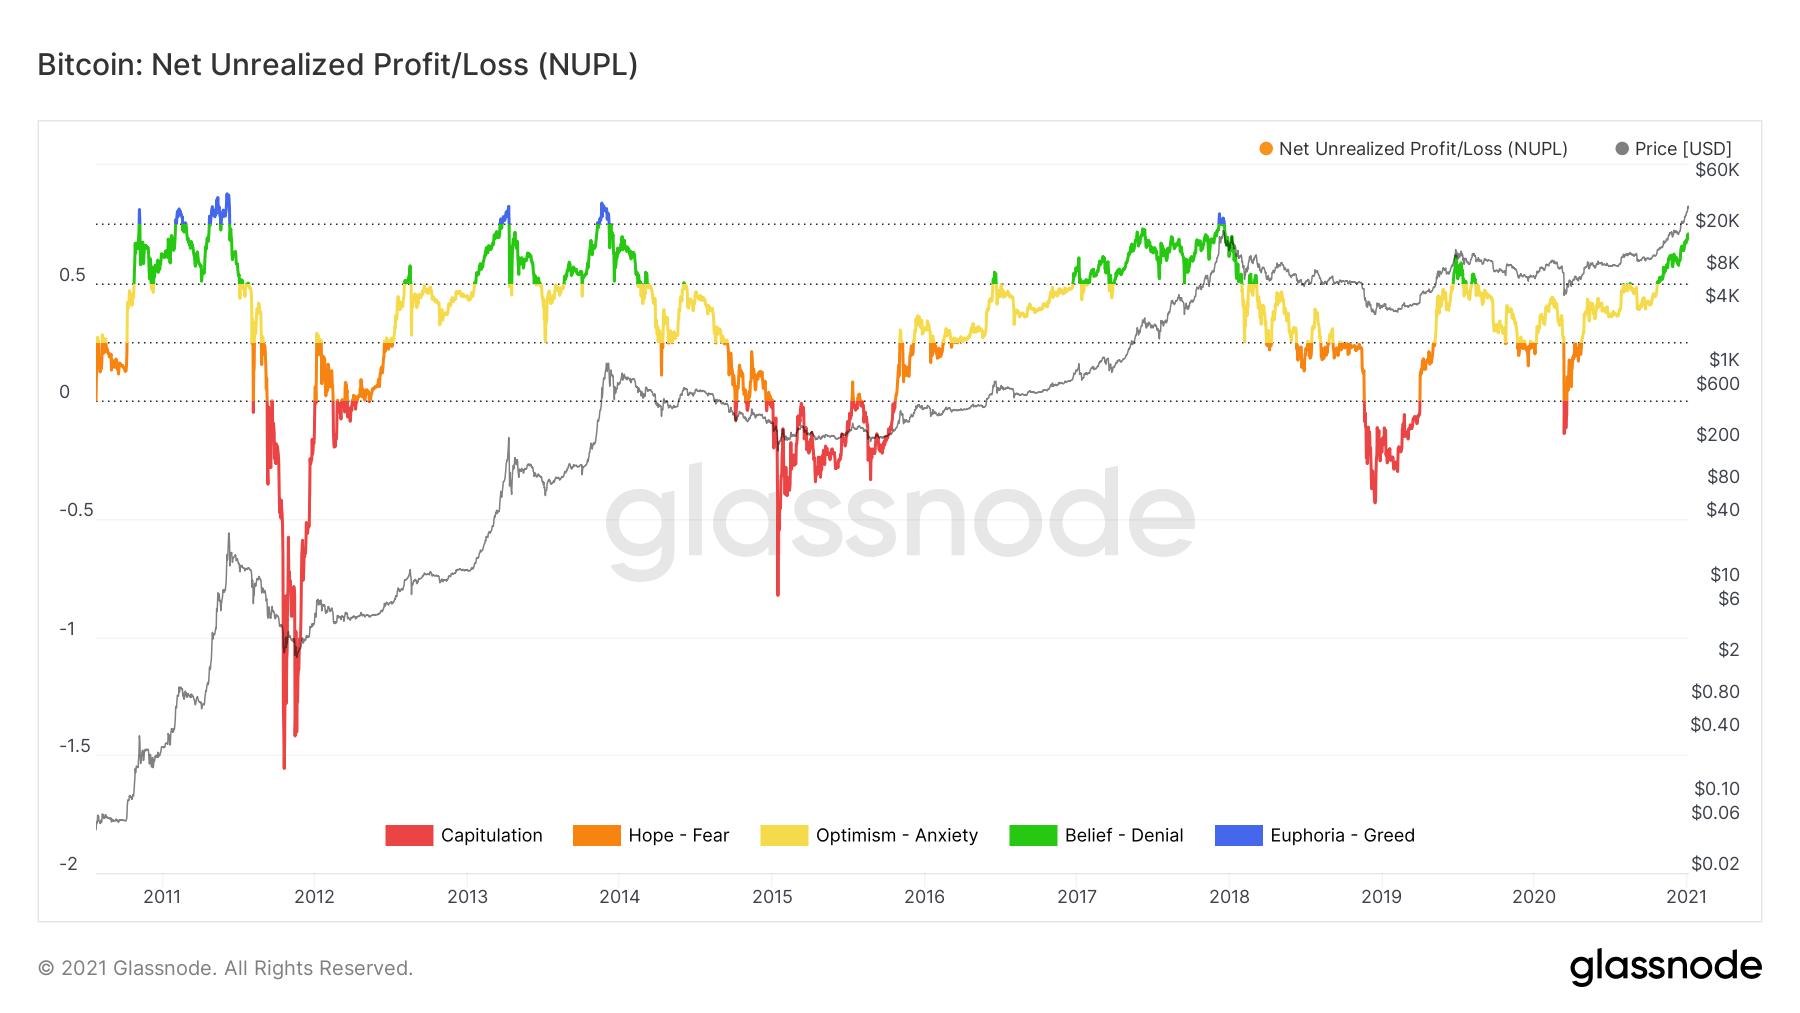 Bitcoin Net Unrealized Profit/Loss